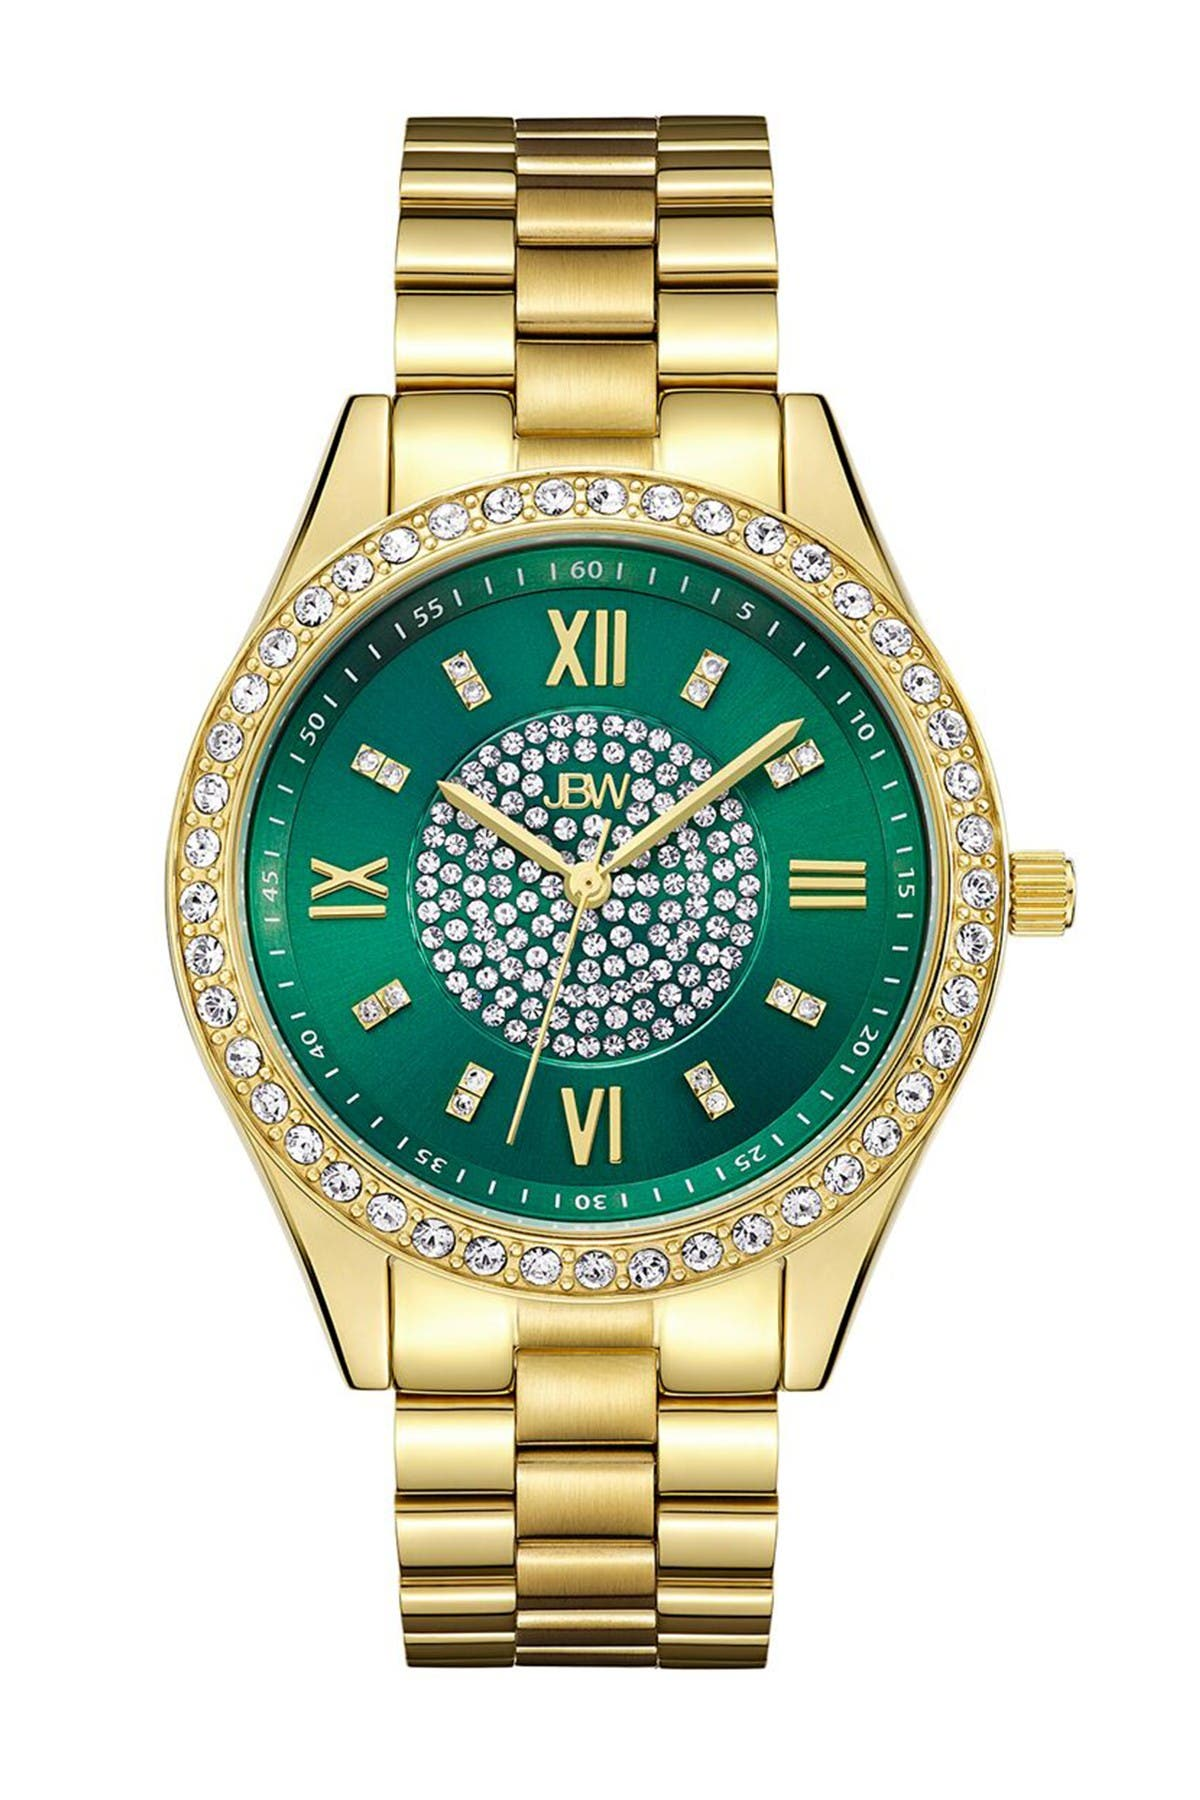 Image of JBW Women's Mondrian 18K Gold Plated Stainless Steel Diamond Bracelet Watch, 37mm - 0.16 ctw